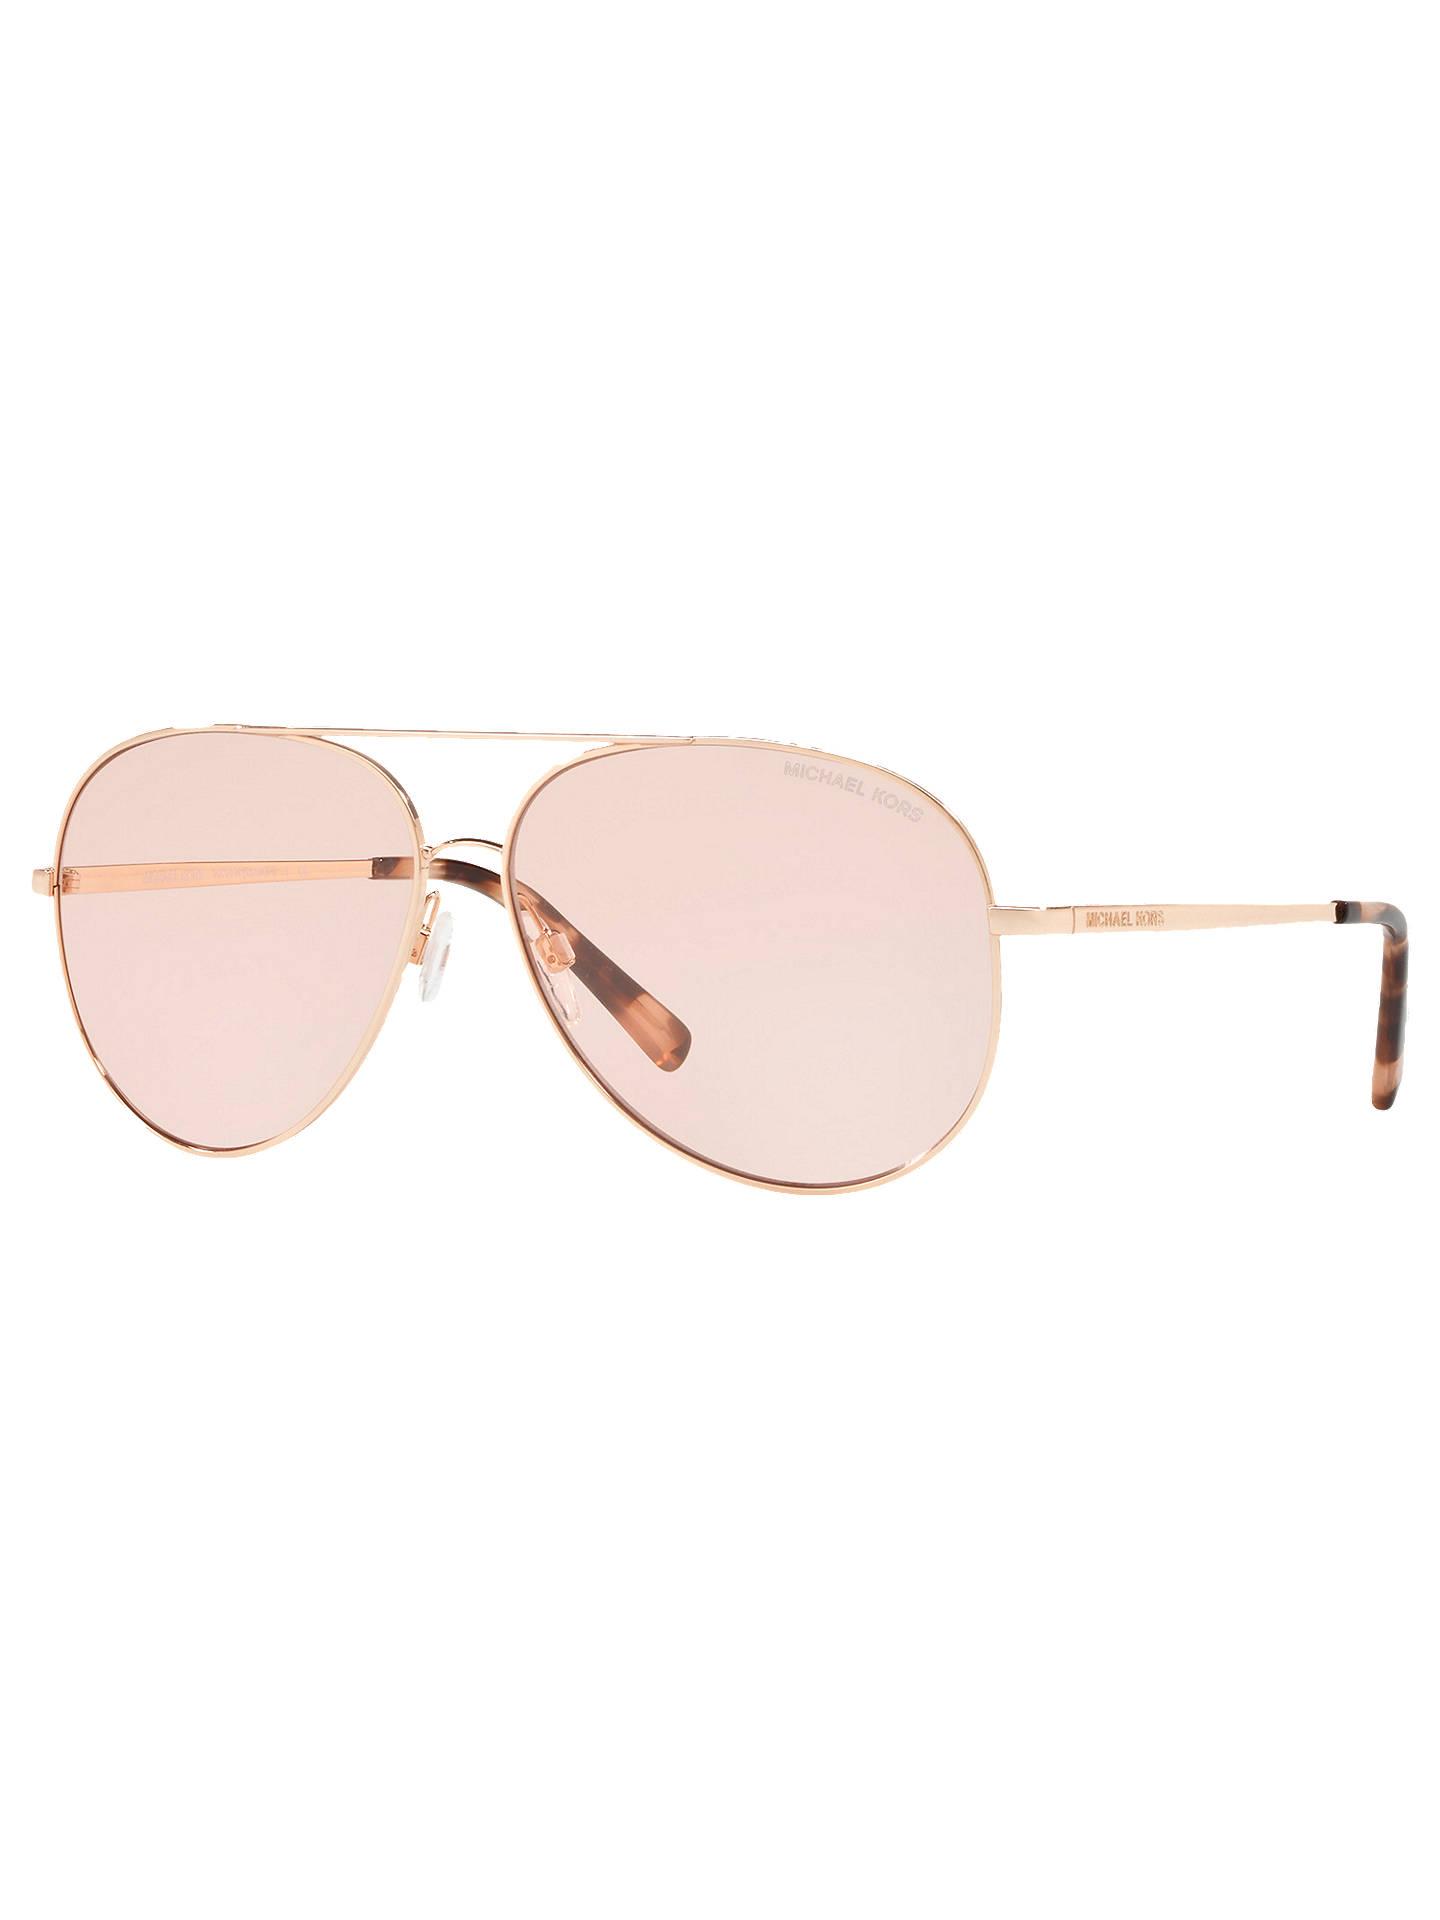 e47e65da1f0 Buy Michael Kors MK5016 Polarised Kendall I Aviator Sunglasses